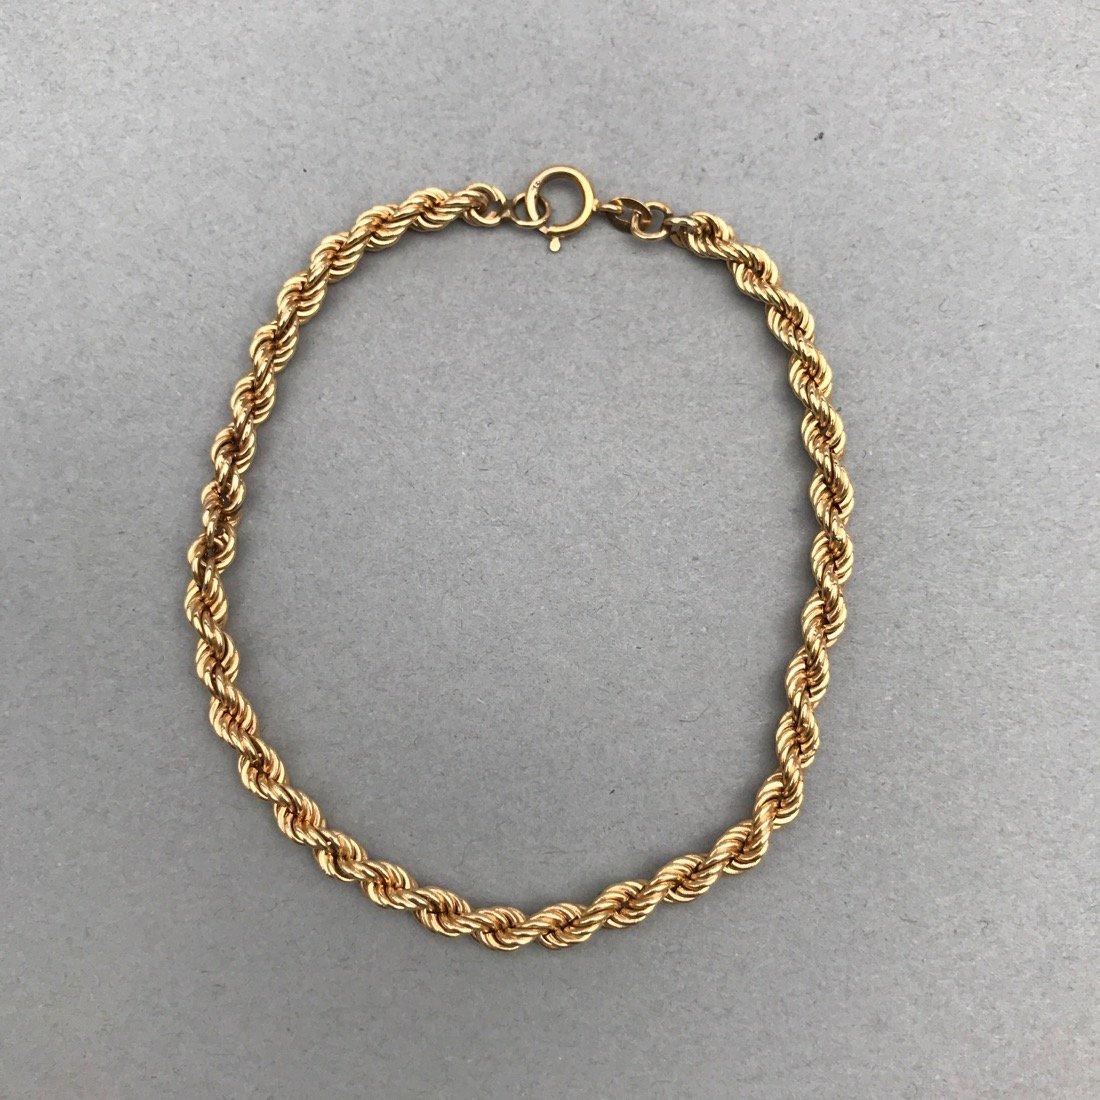 14K Gold Twisted Chain Bracelet